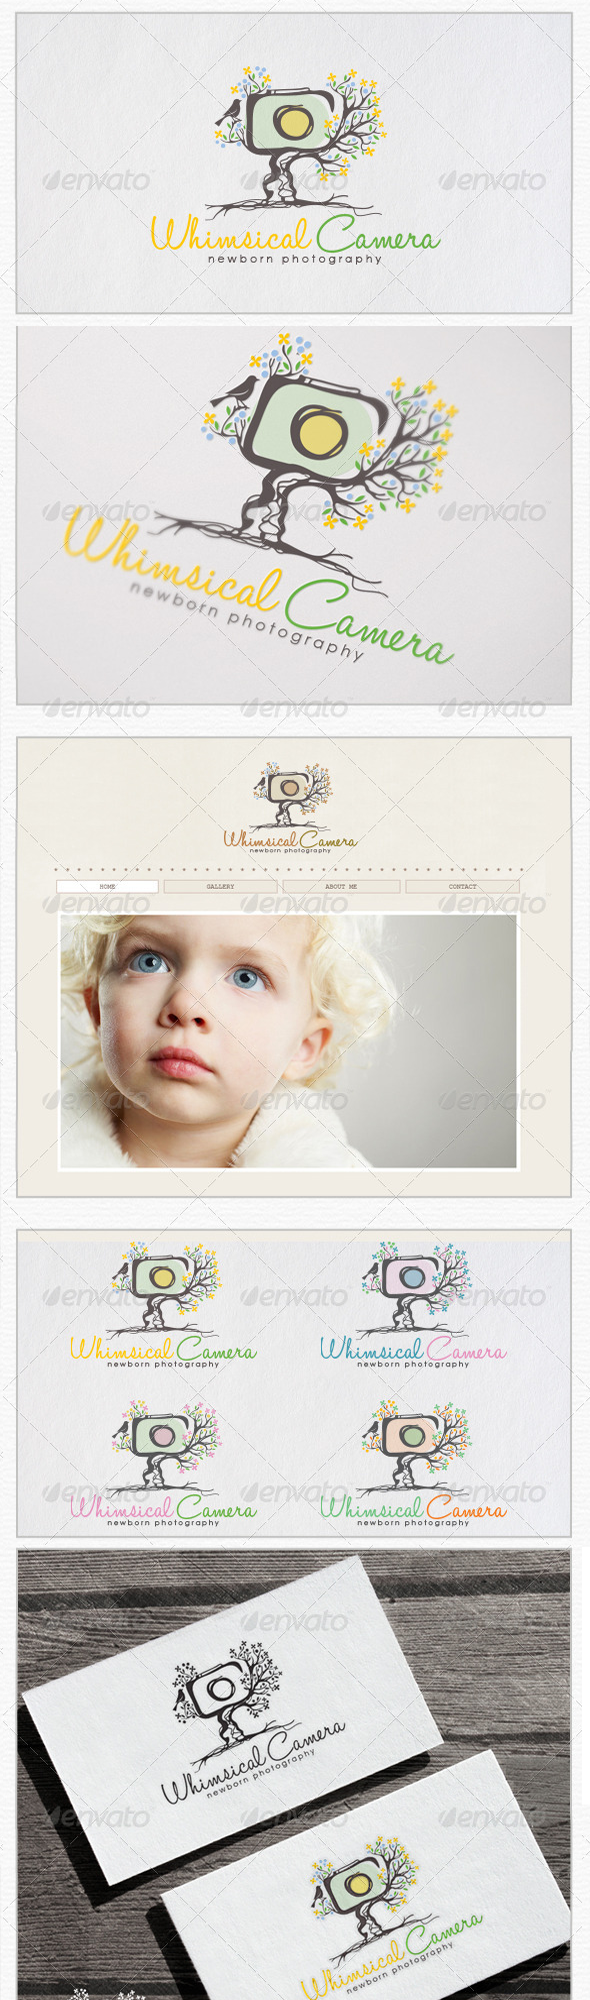 Whimsical-Camera-Tree-Newborn-Photography-Logo